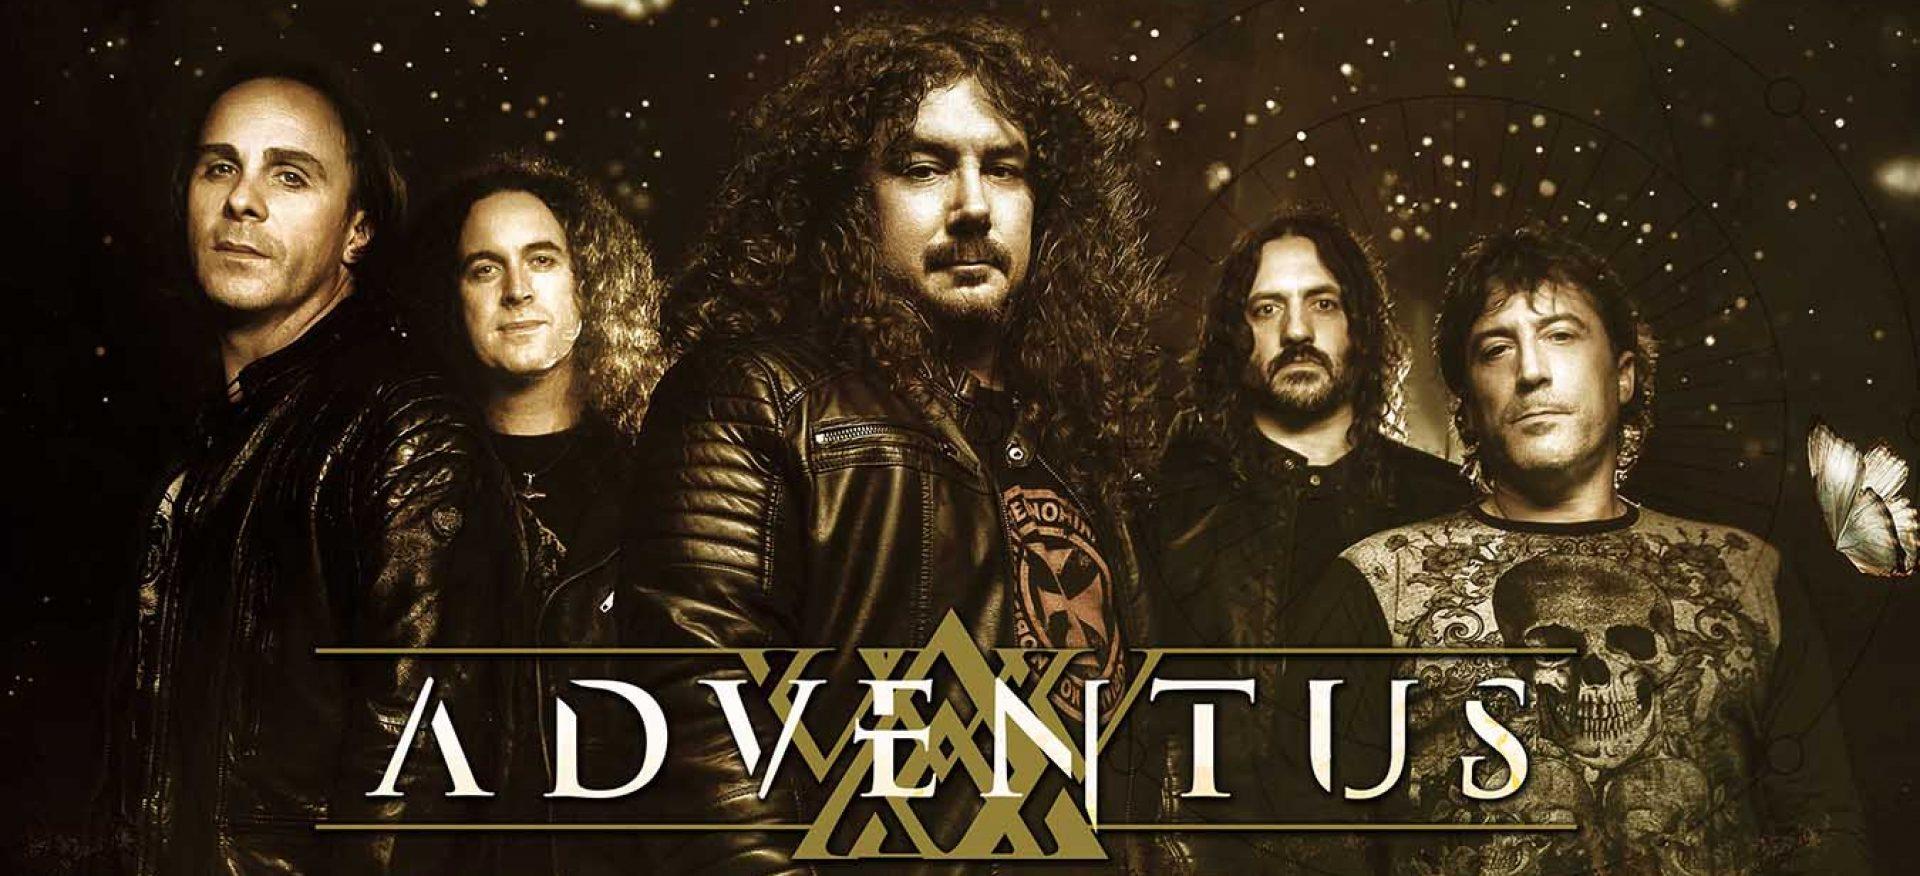 Adventus photo band